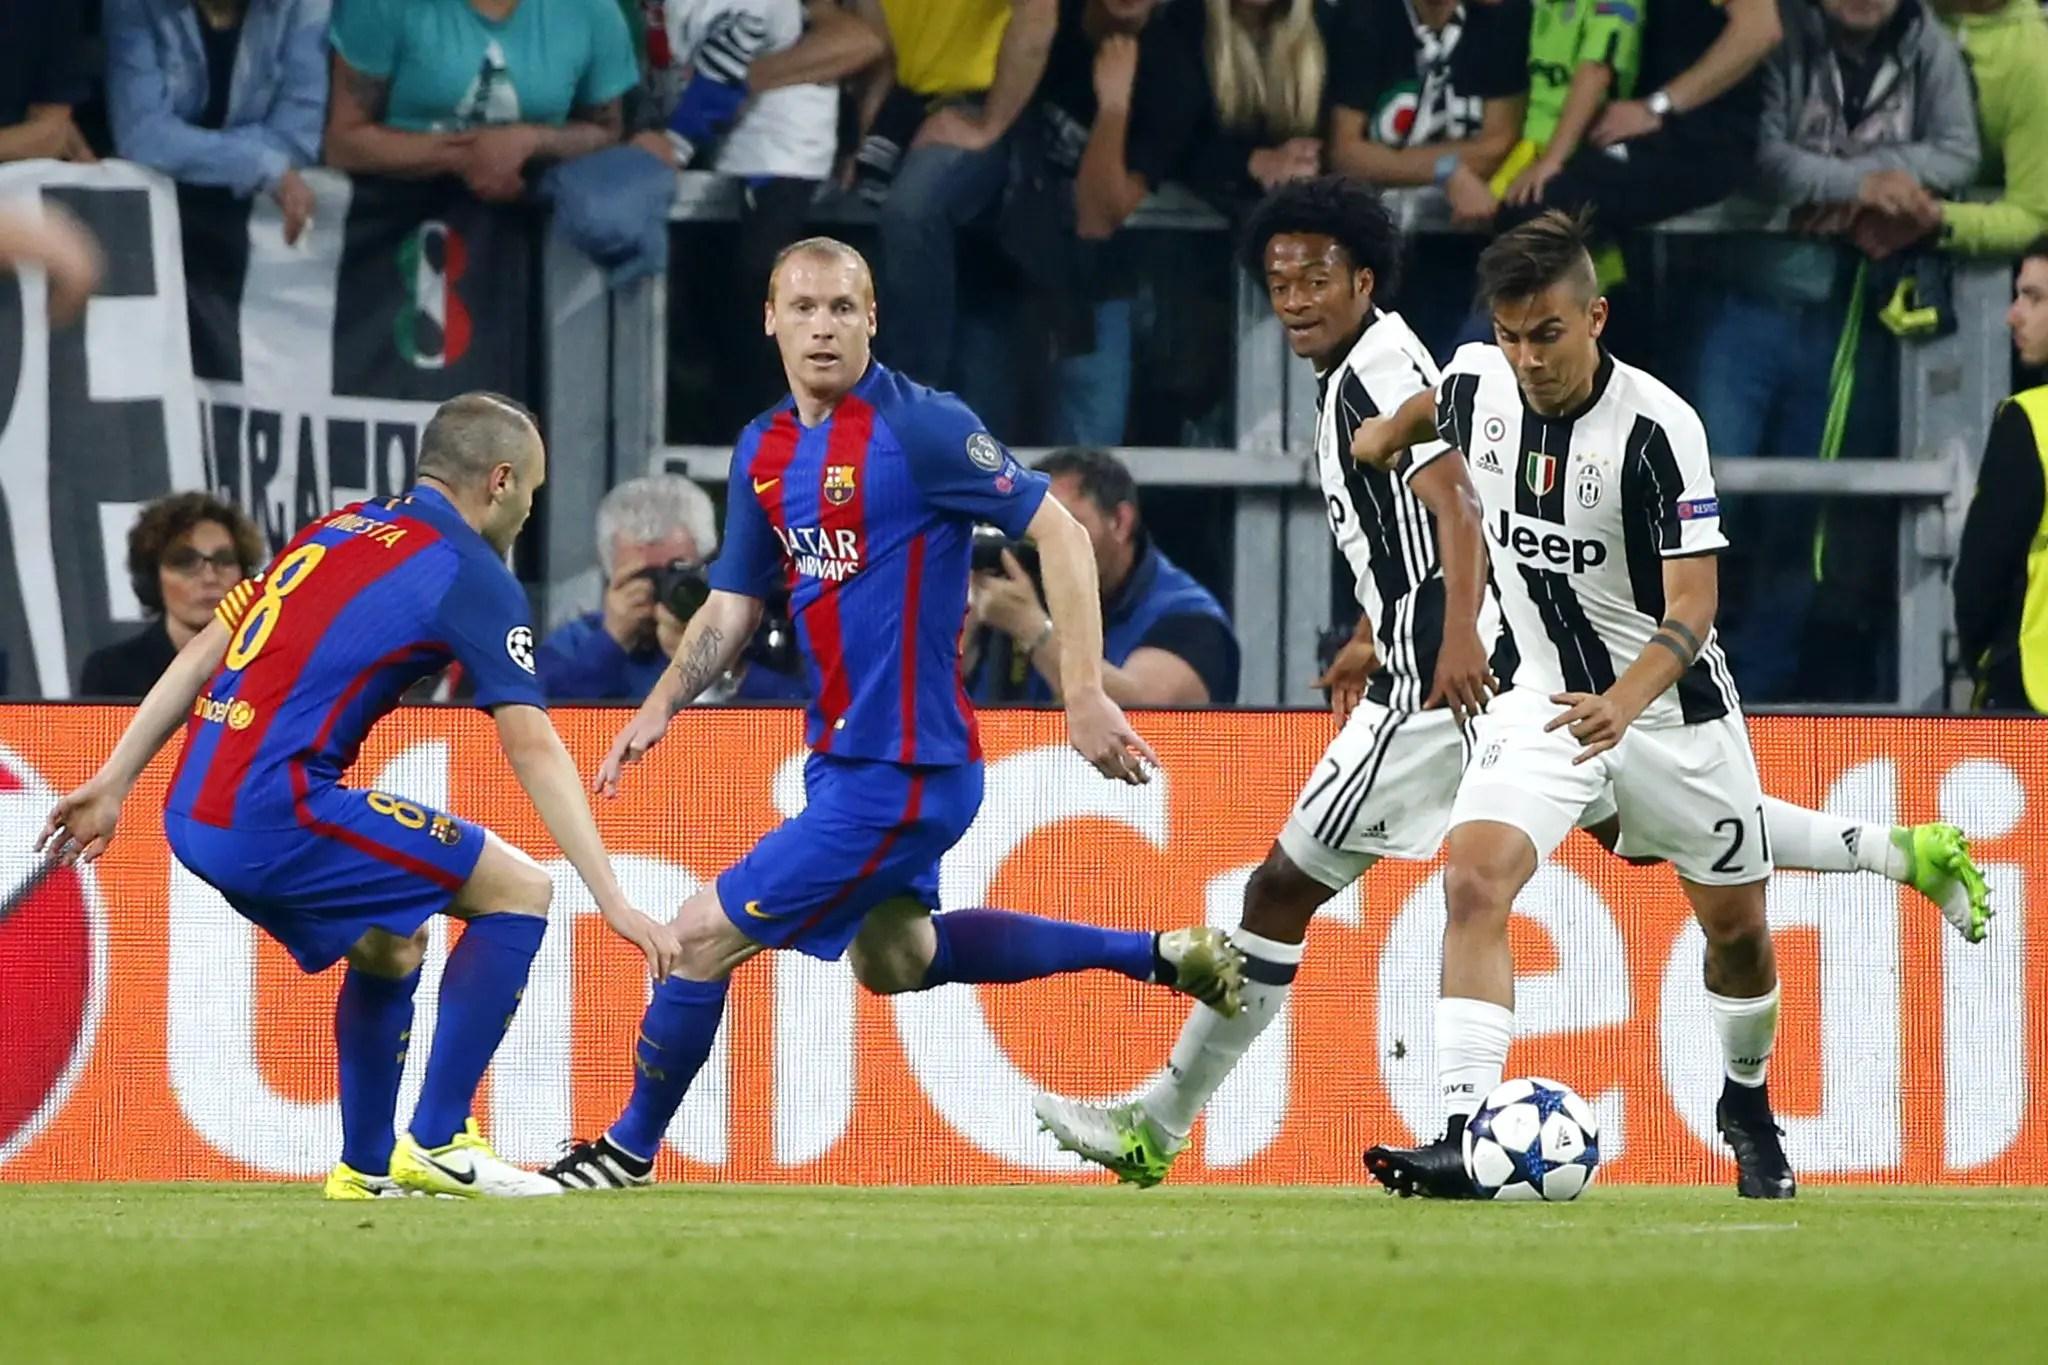 UCL: Dybala Nets Brace As Juventus Outclass Poor Barca